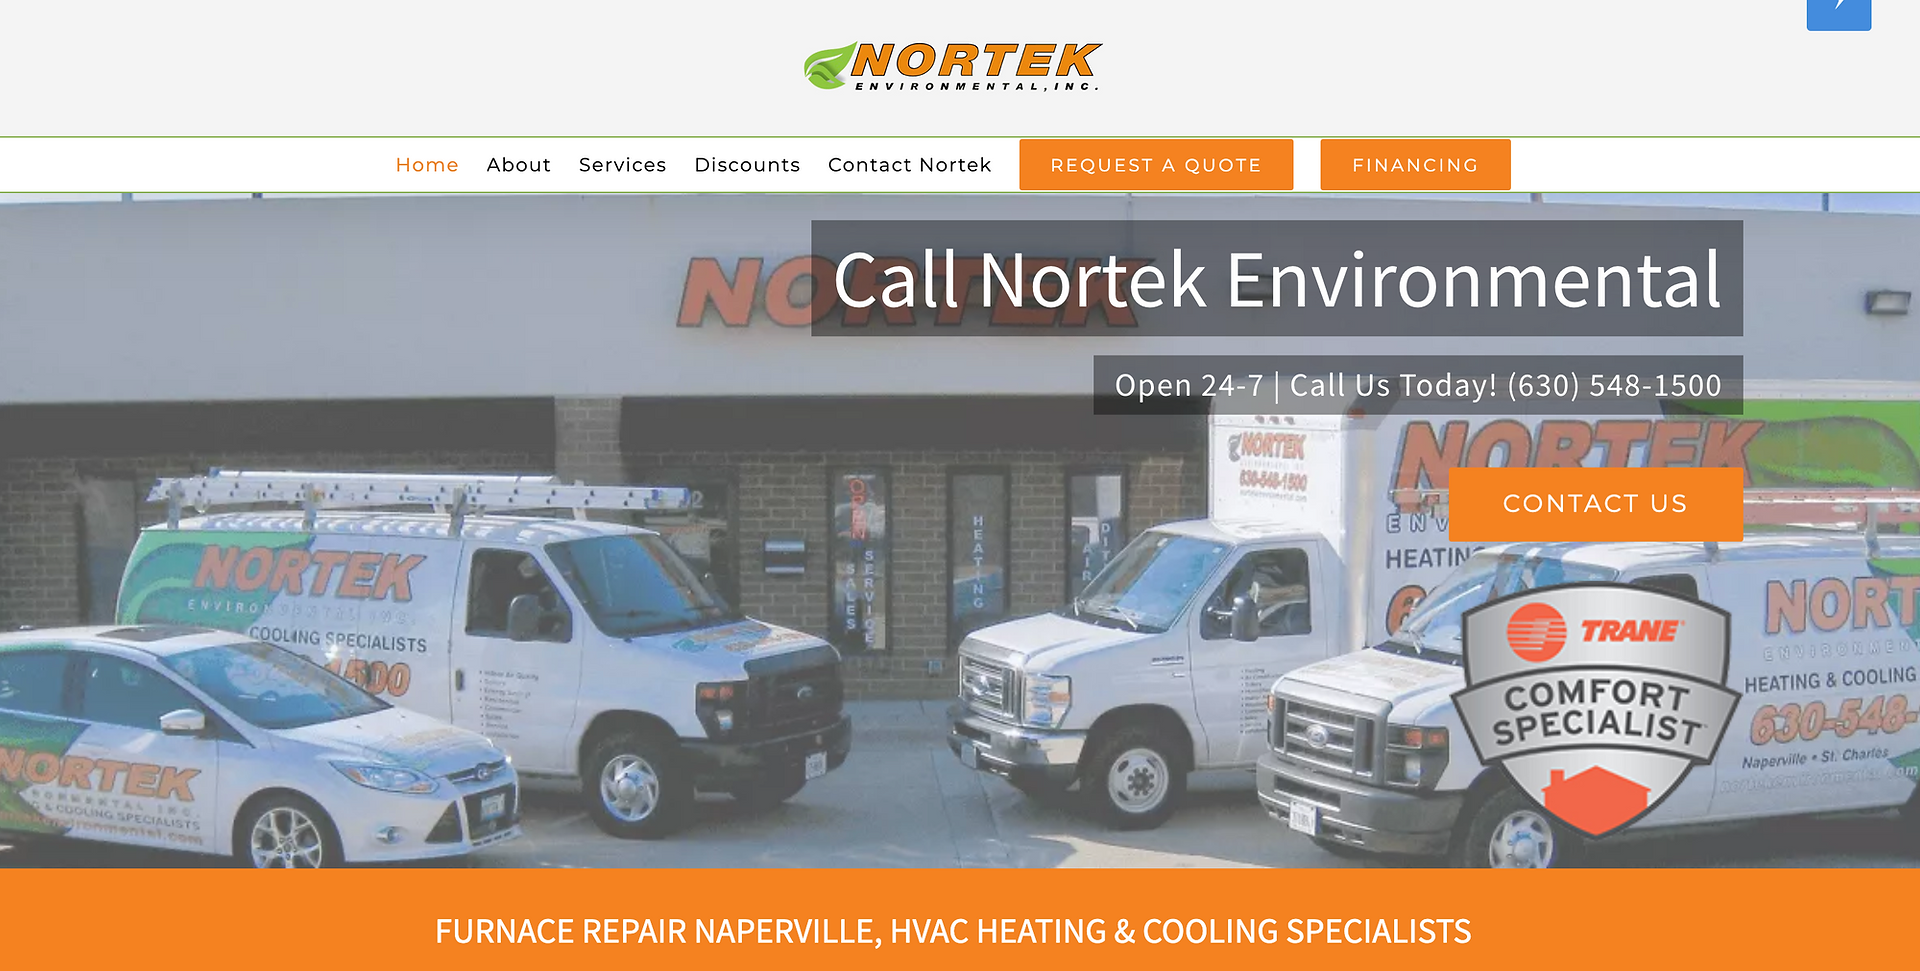 Website Design Naperville IL